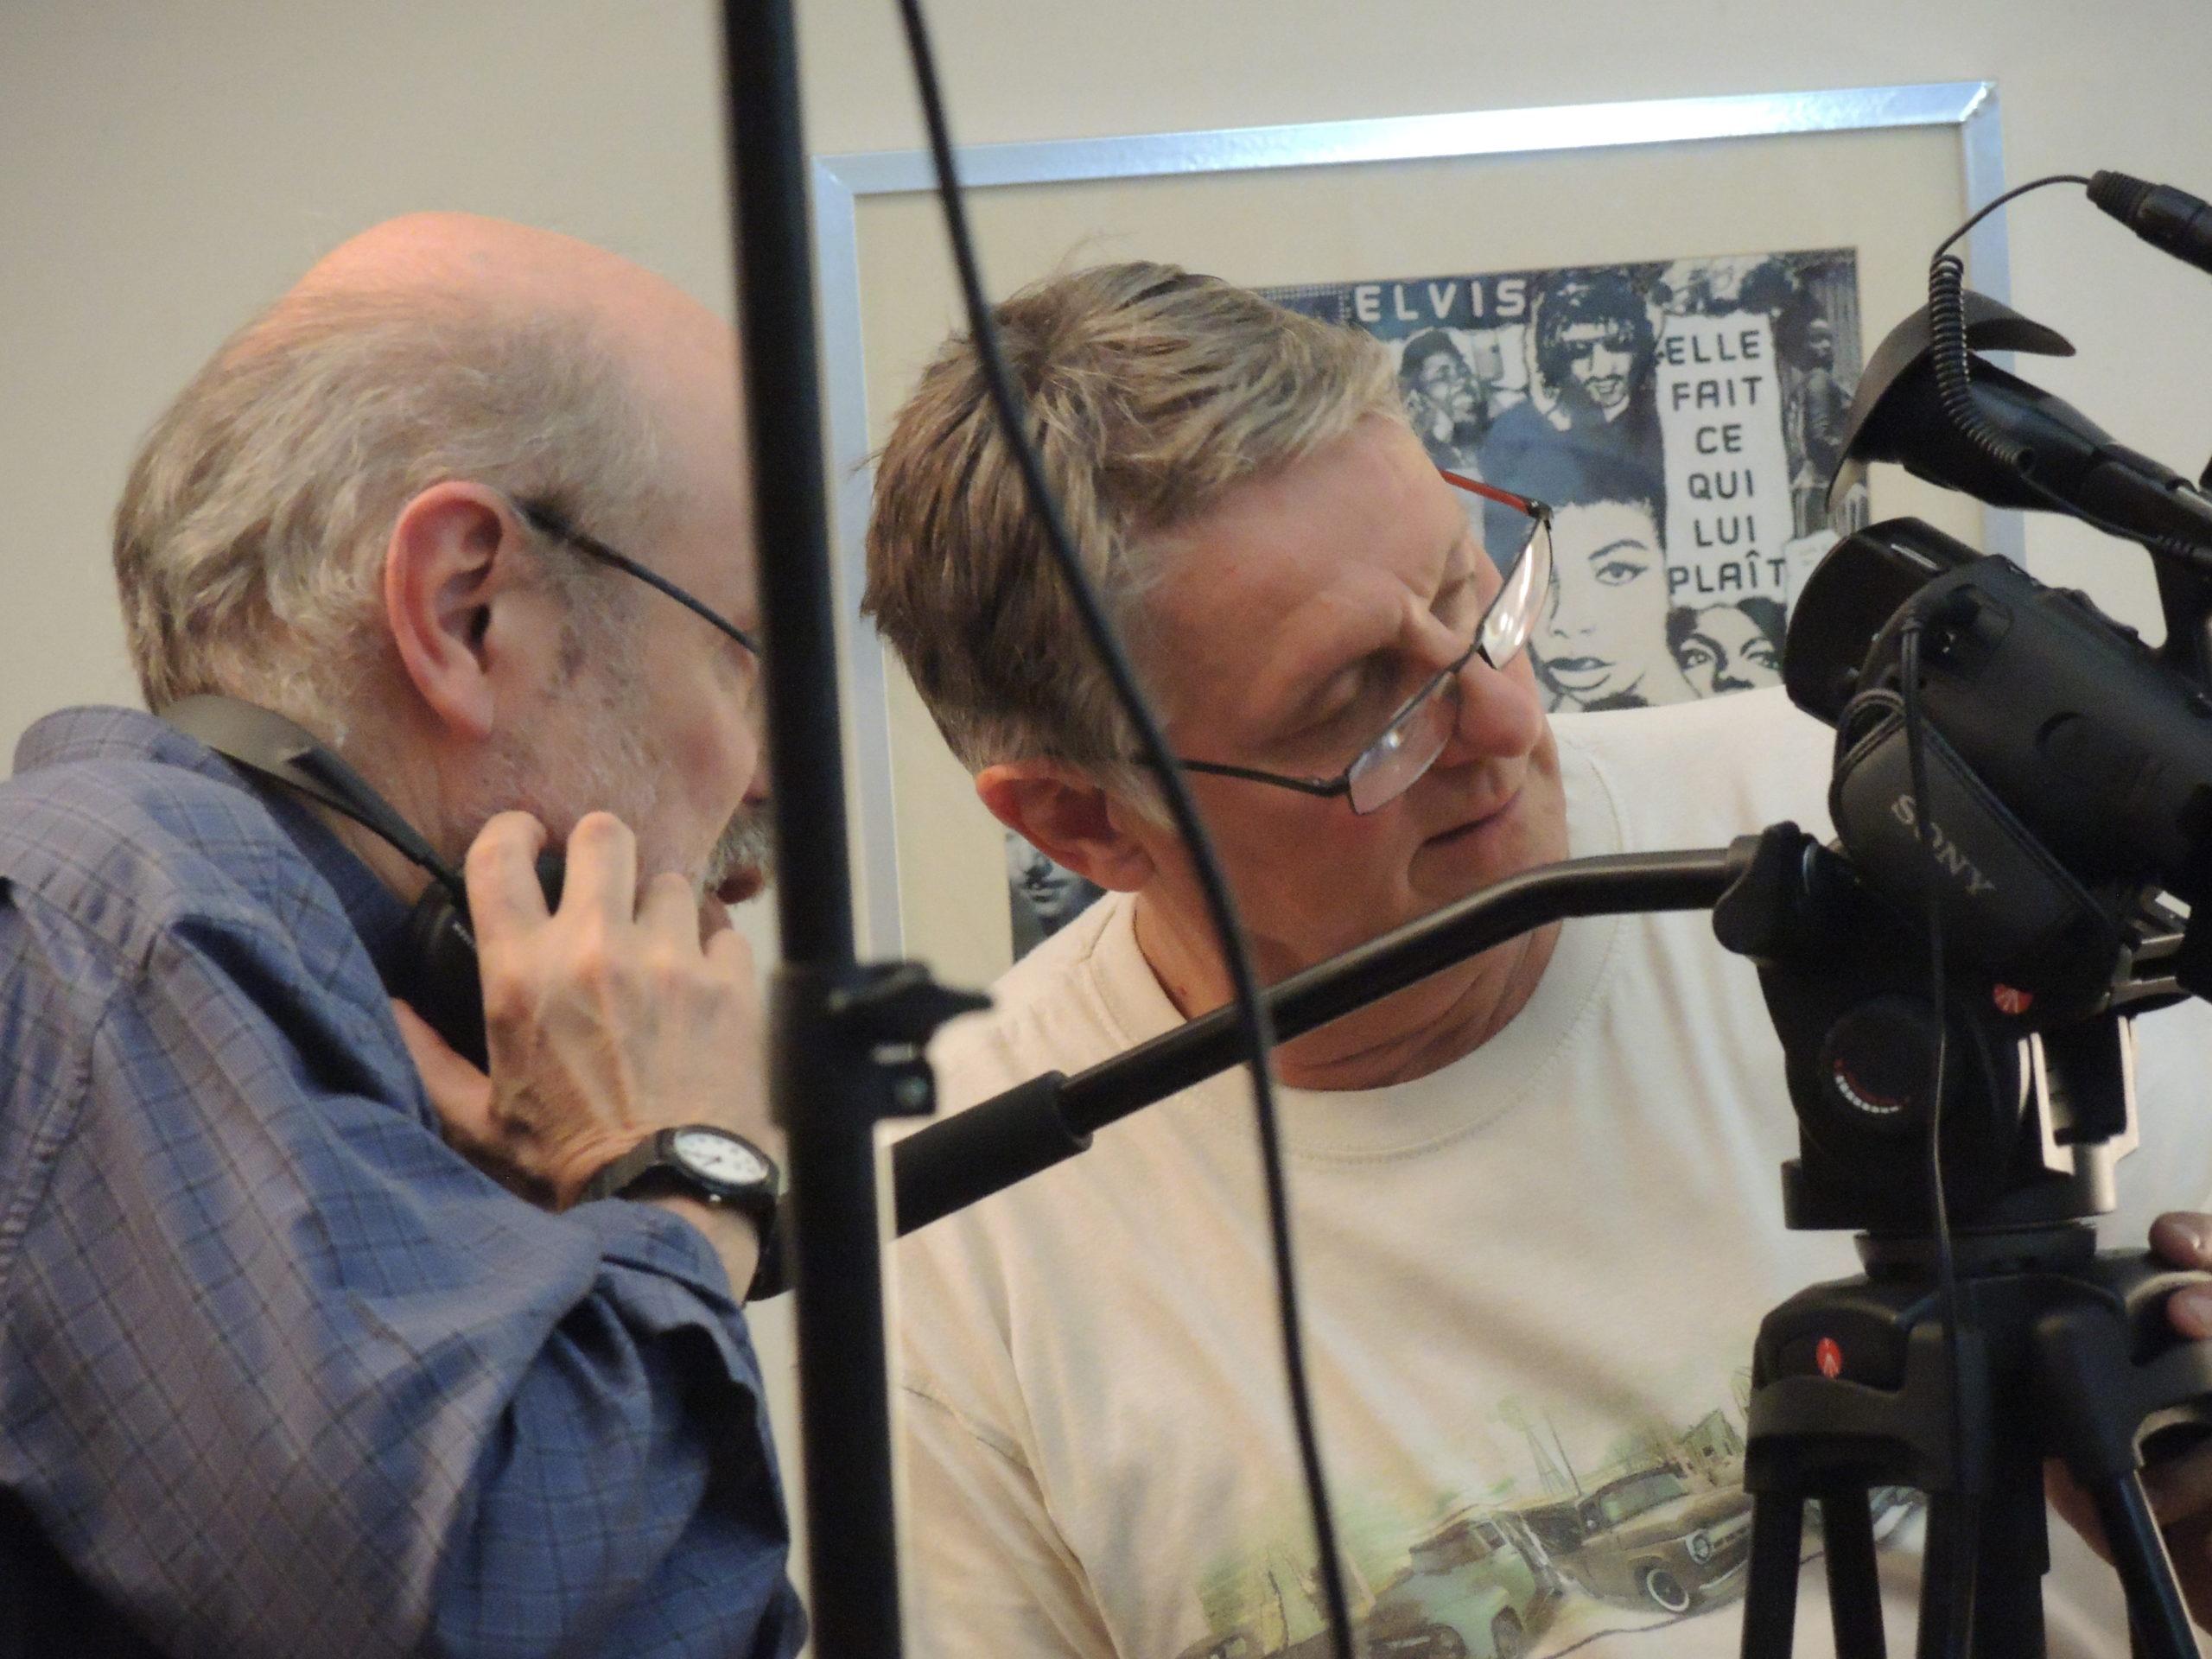 Game over photos tournage 59